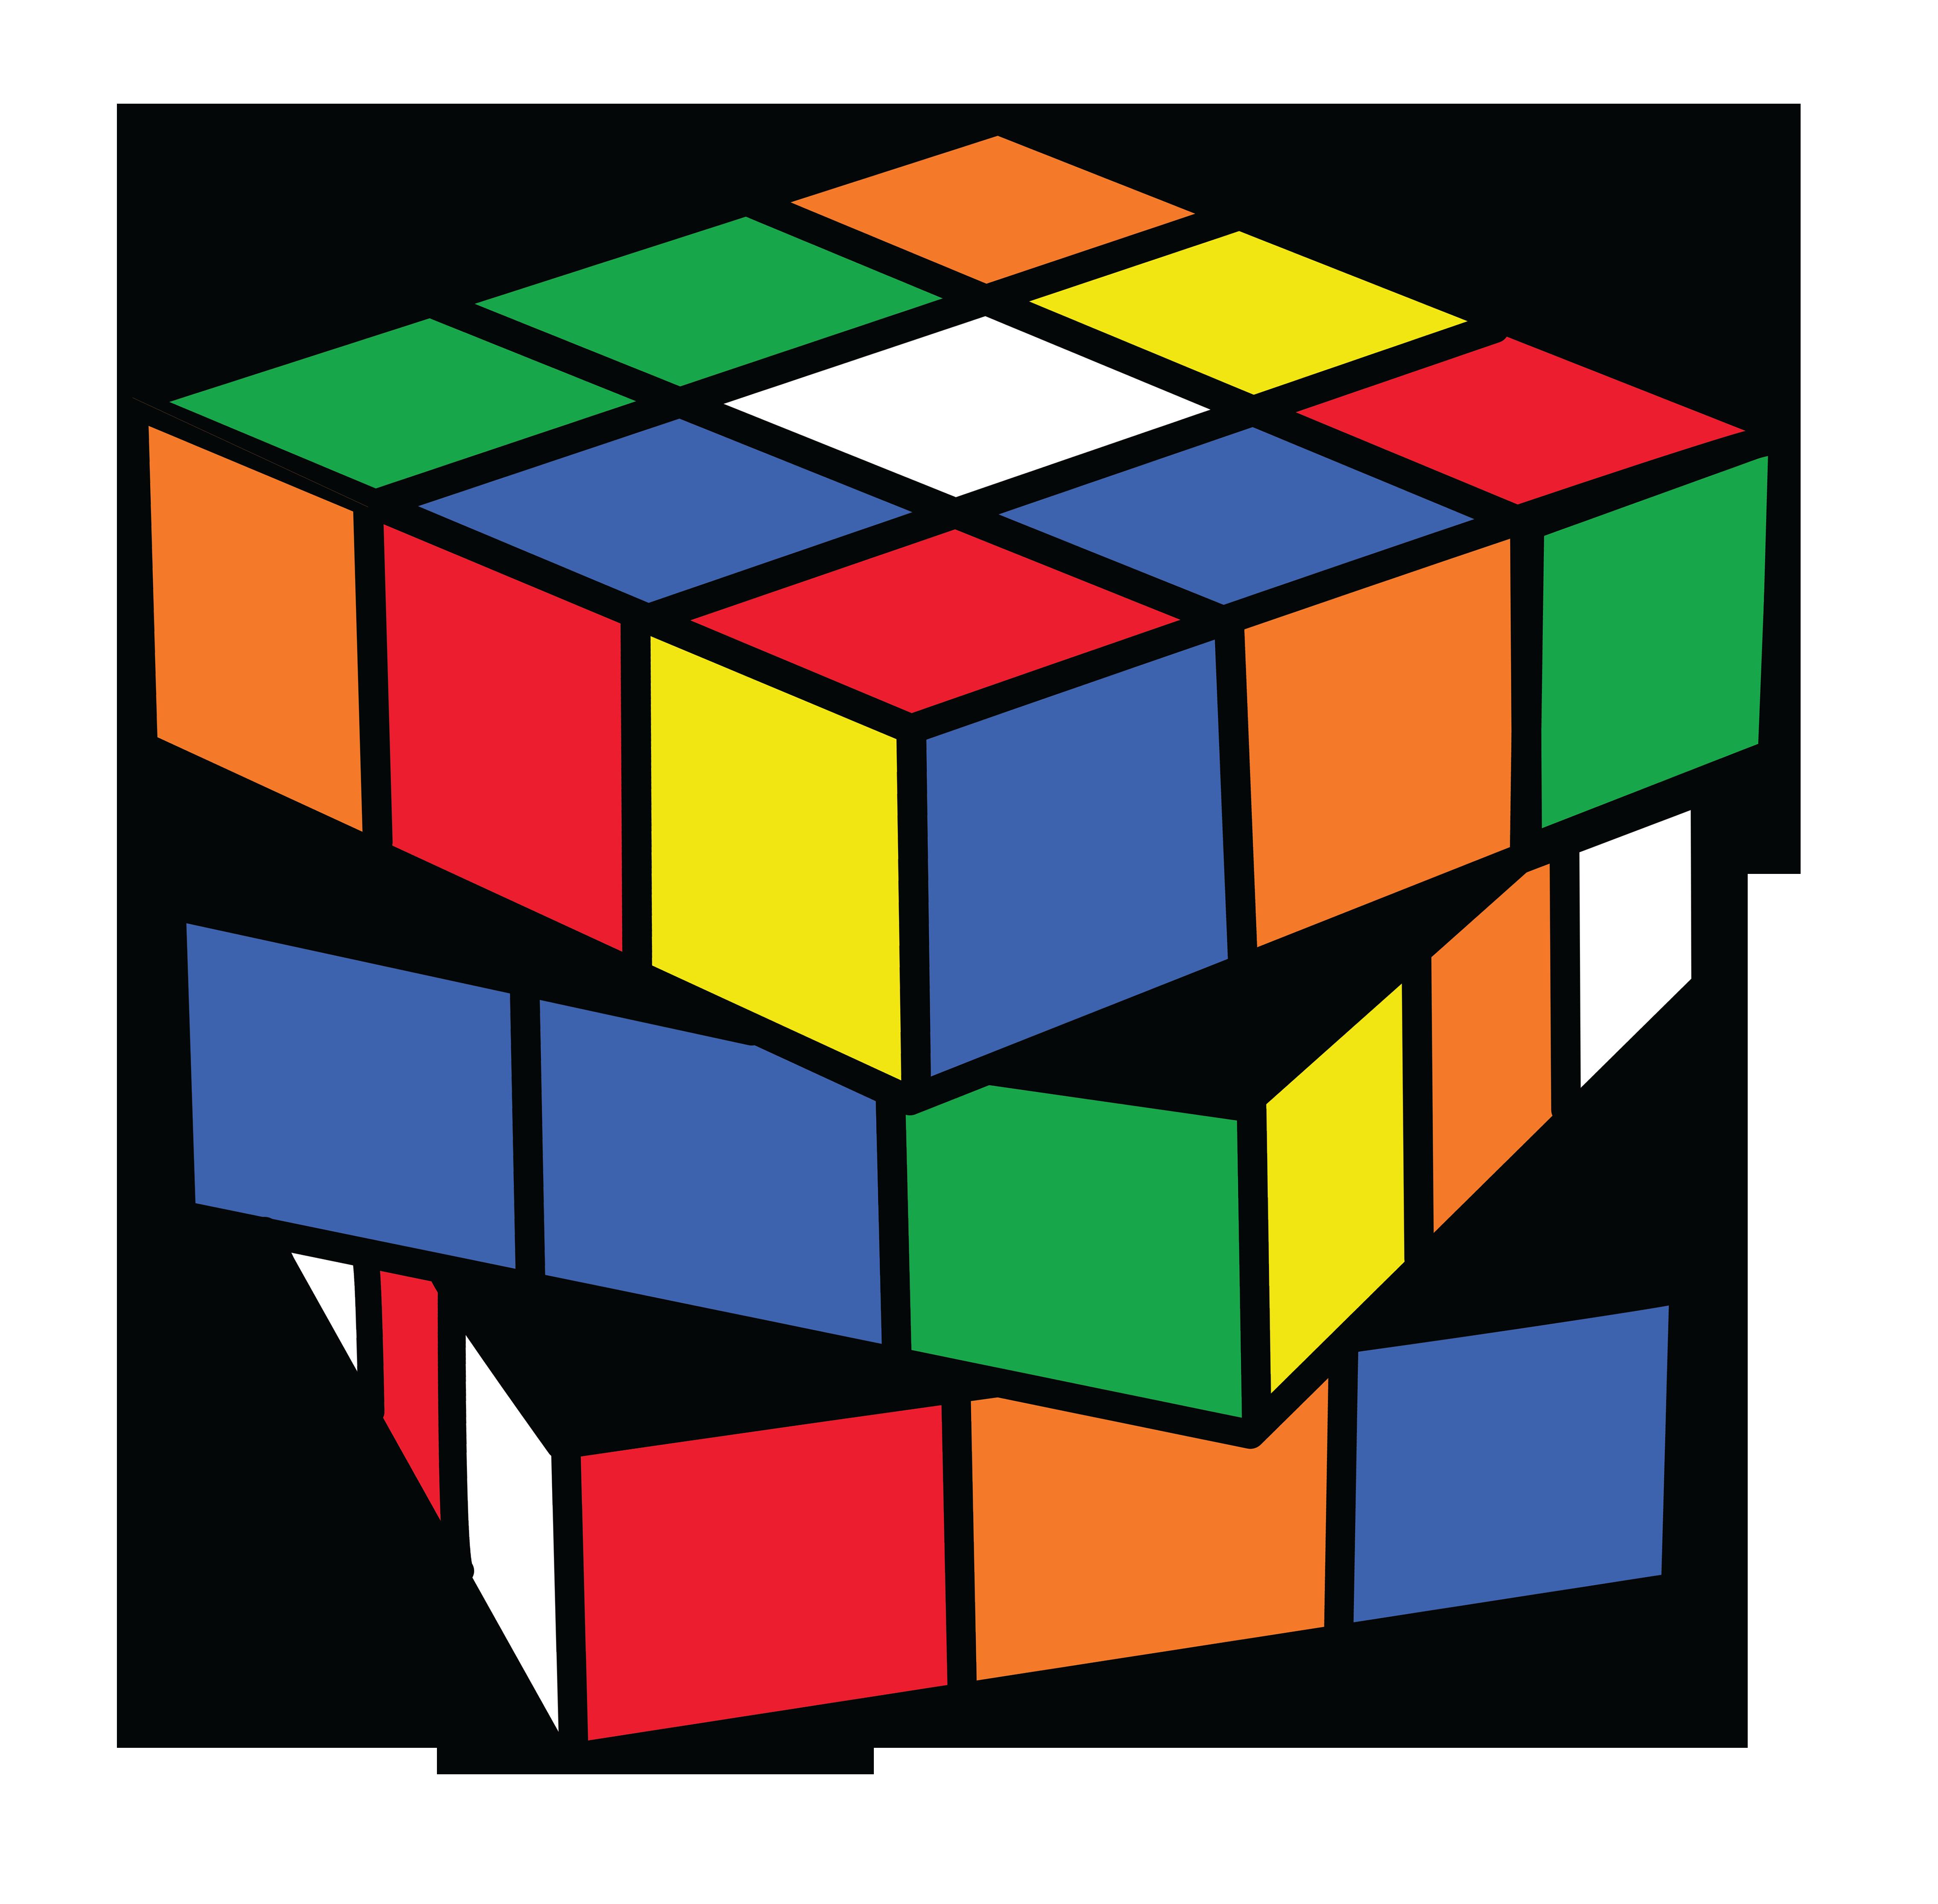 Rubiks Cube Puzzle Clipart.